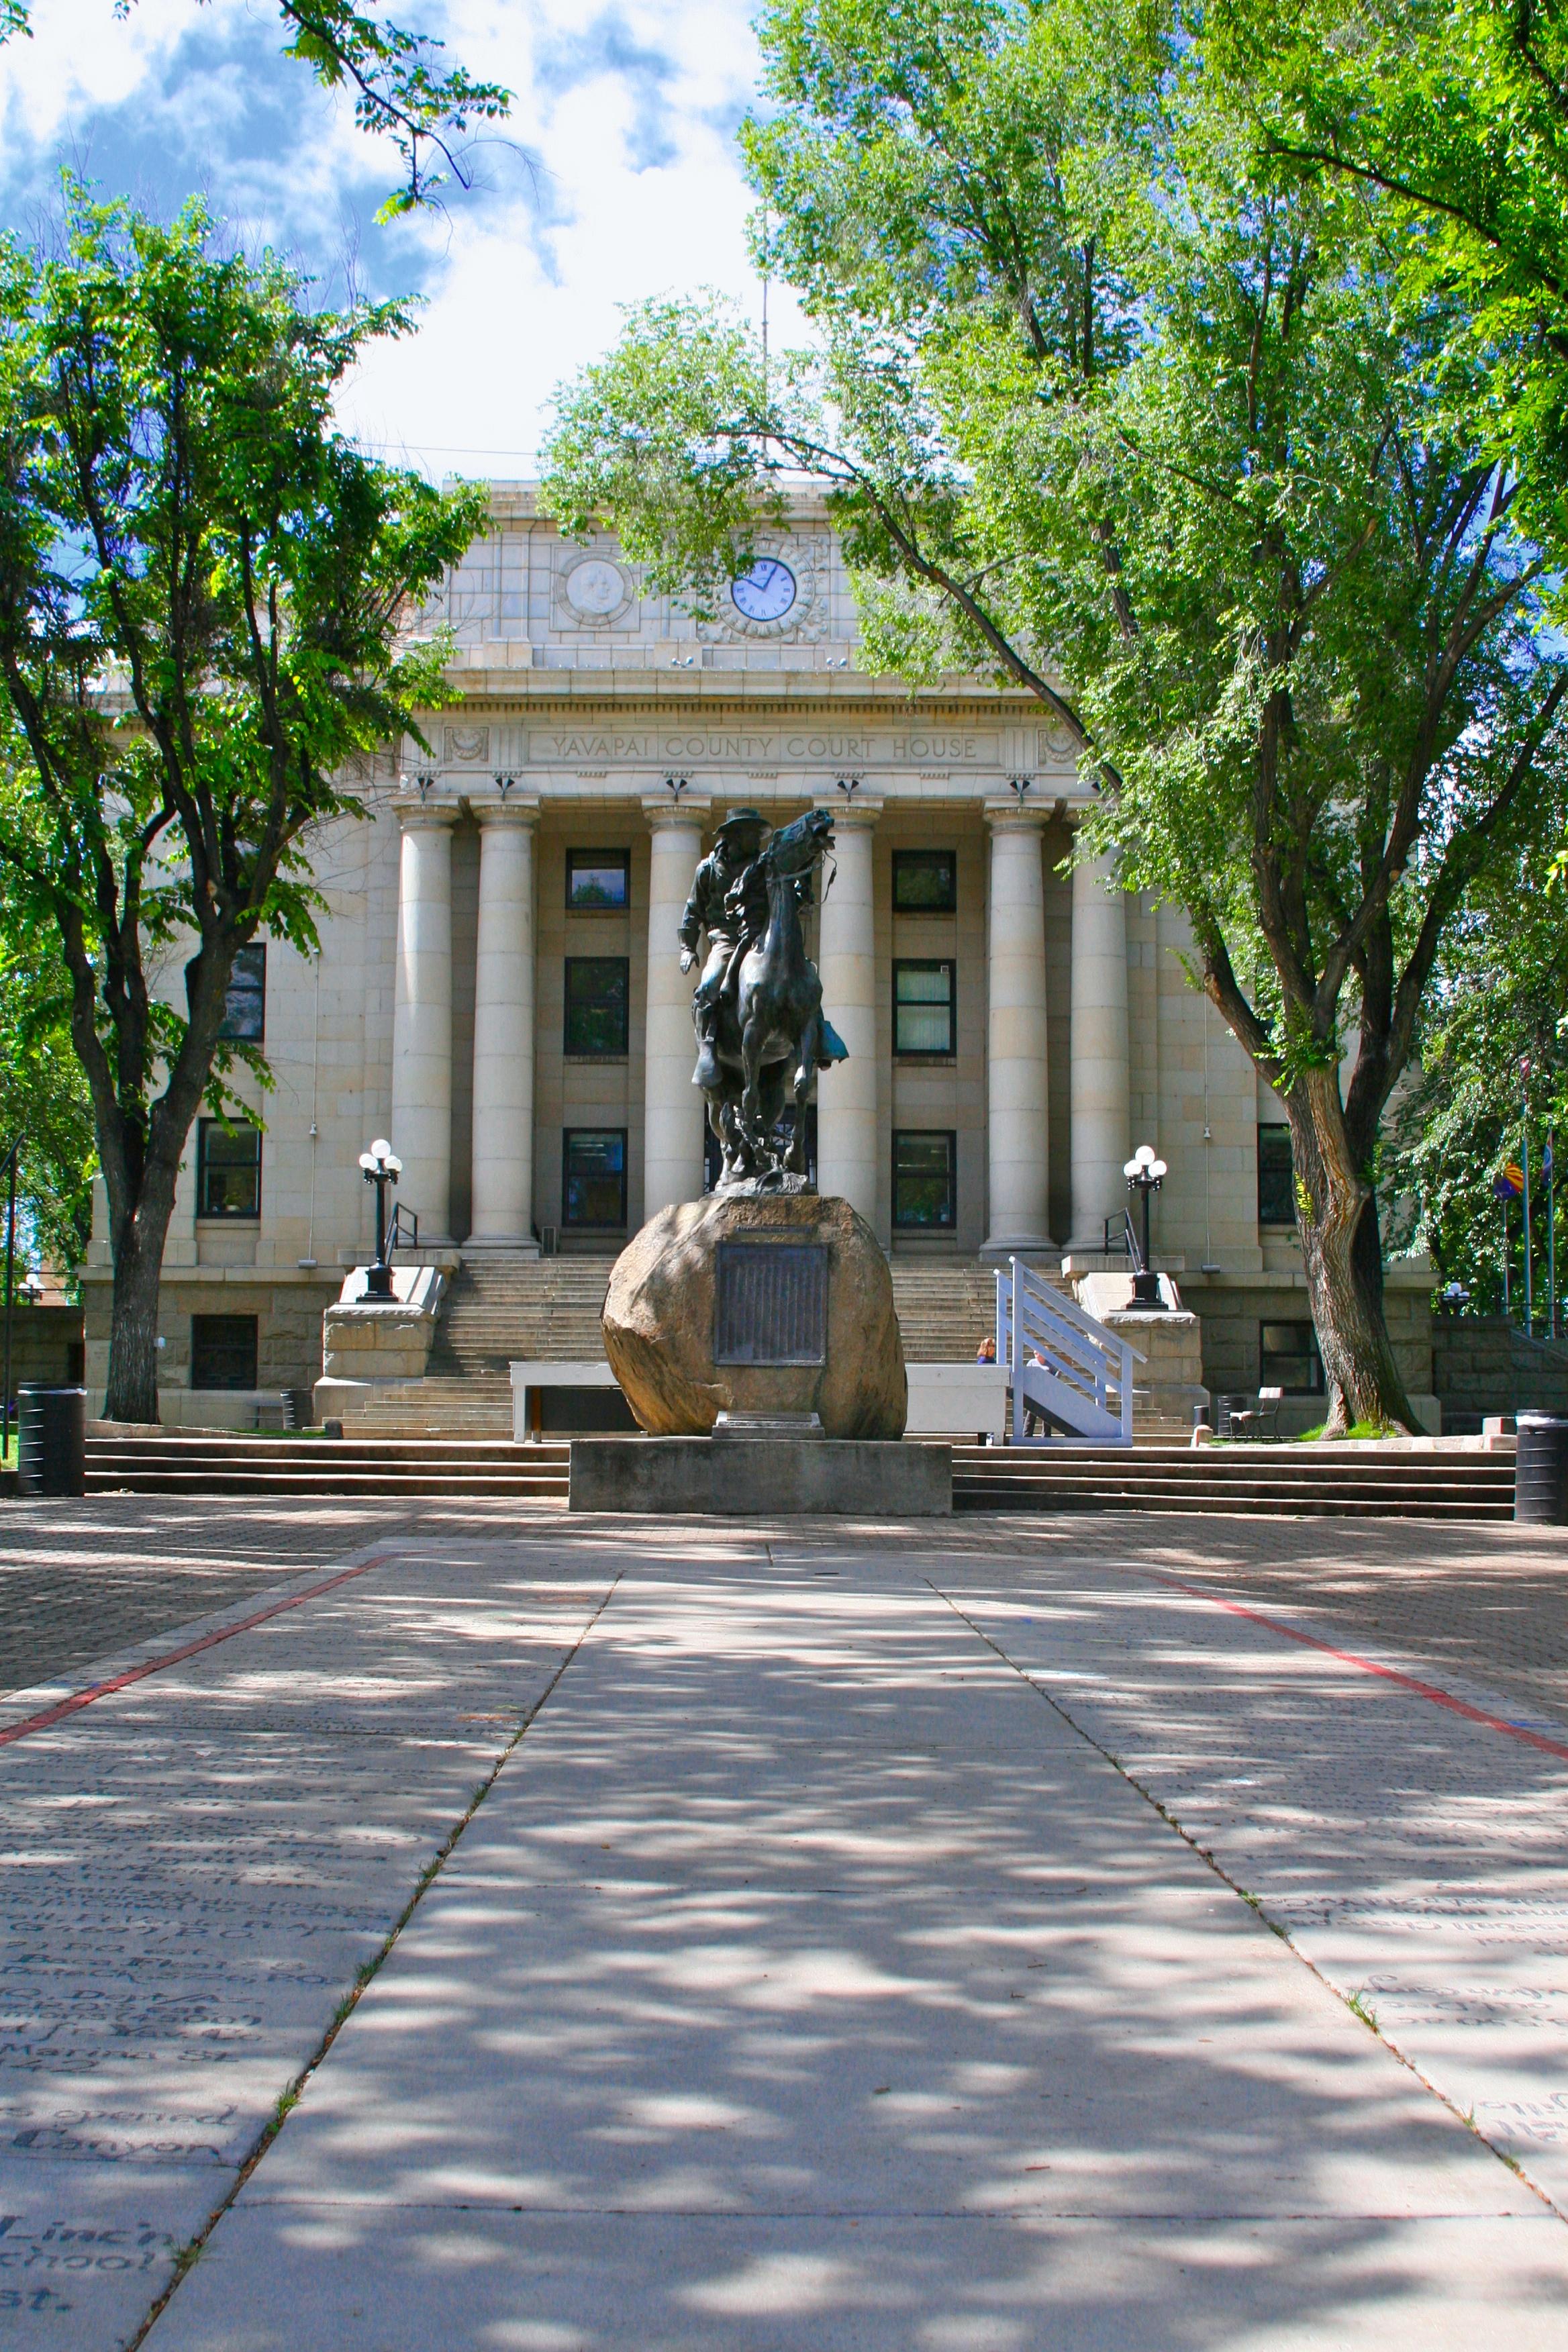 Prescott AZ Courthouse